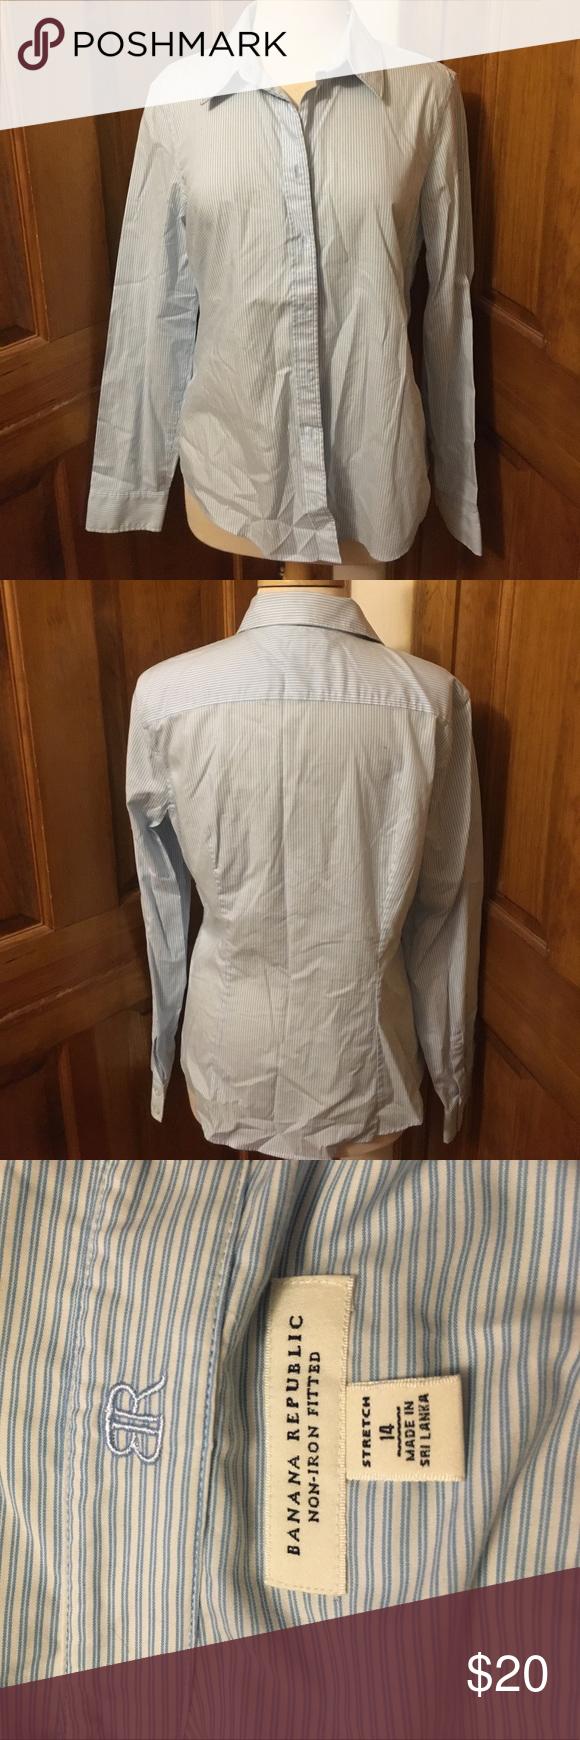 "Light blue striped button down top Iight blue striped button down blouse- ""non-iron fitted""""stretch"" Banana Republic Tops Button Down Shirts"